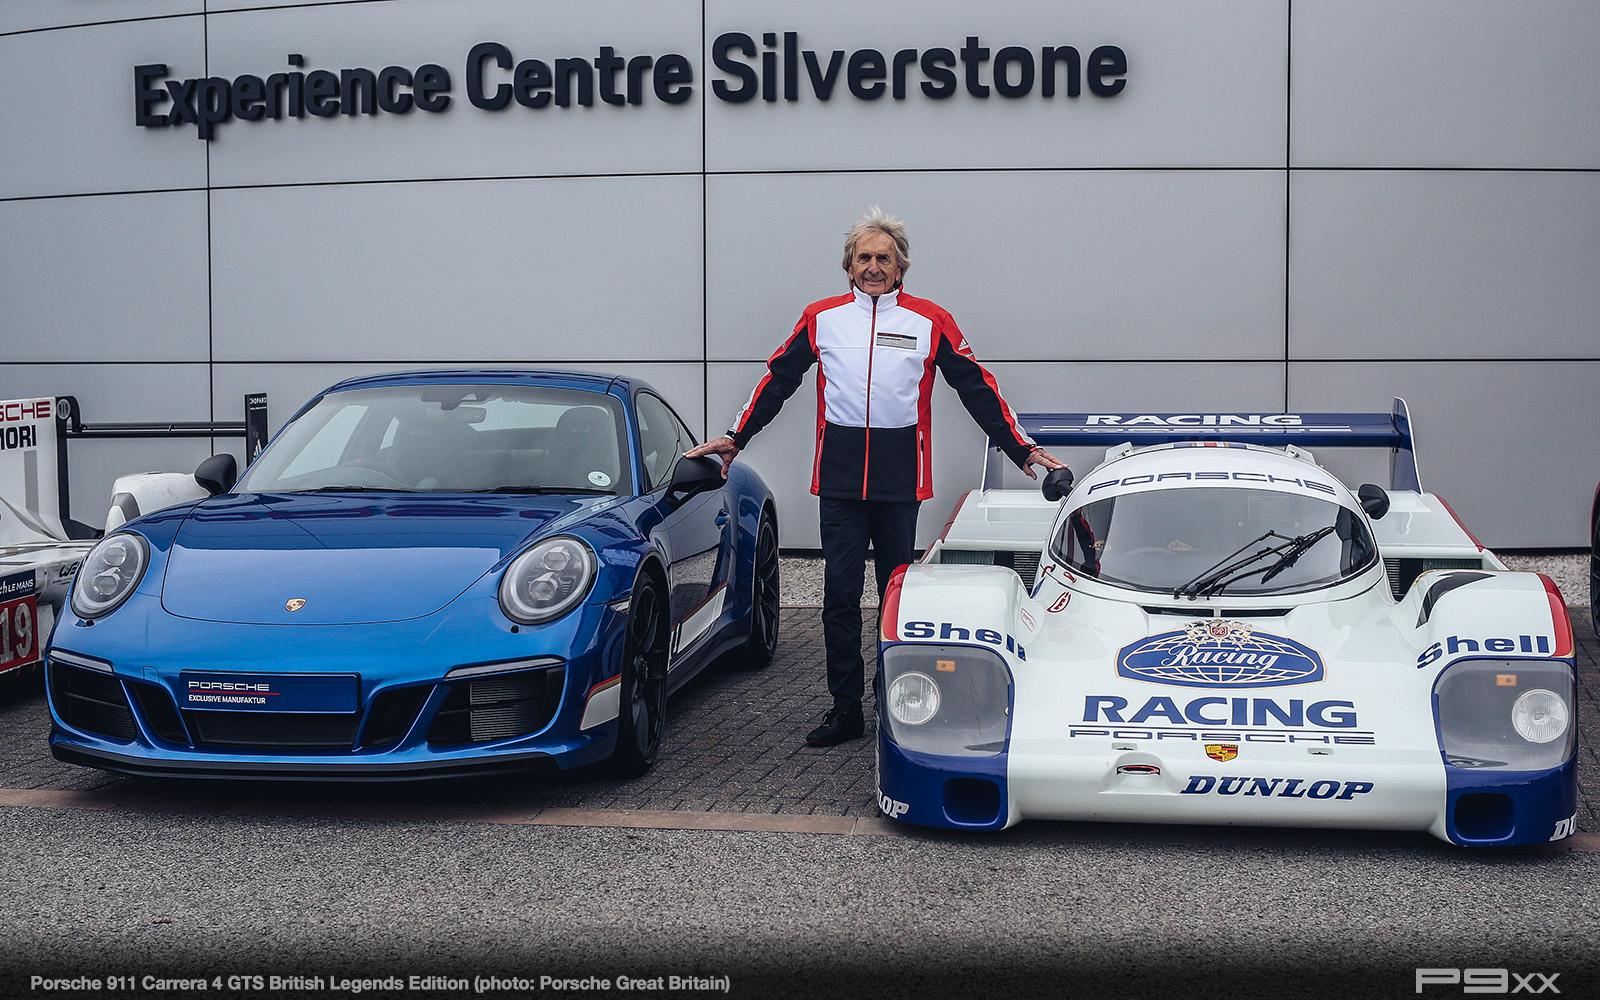 Porsche-911-Carrera-4-GTS-British-Legends-Edition-380